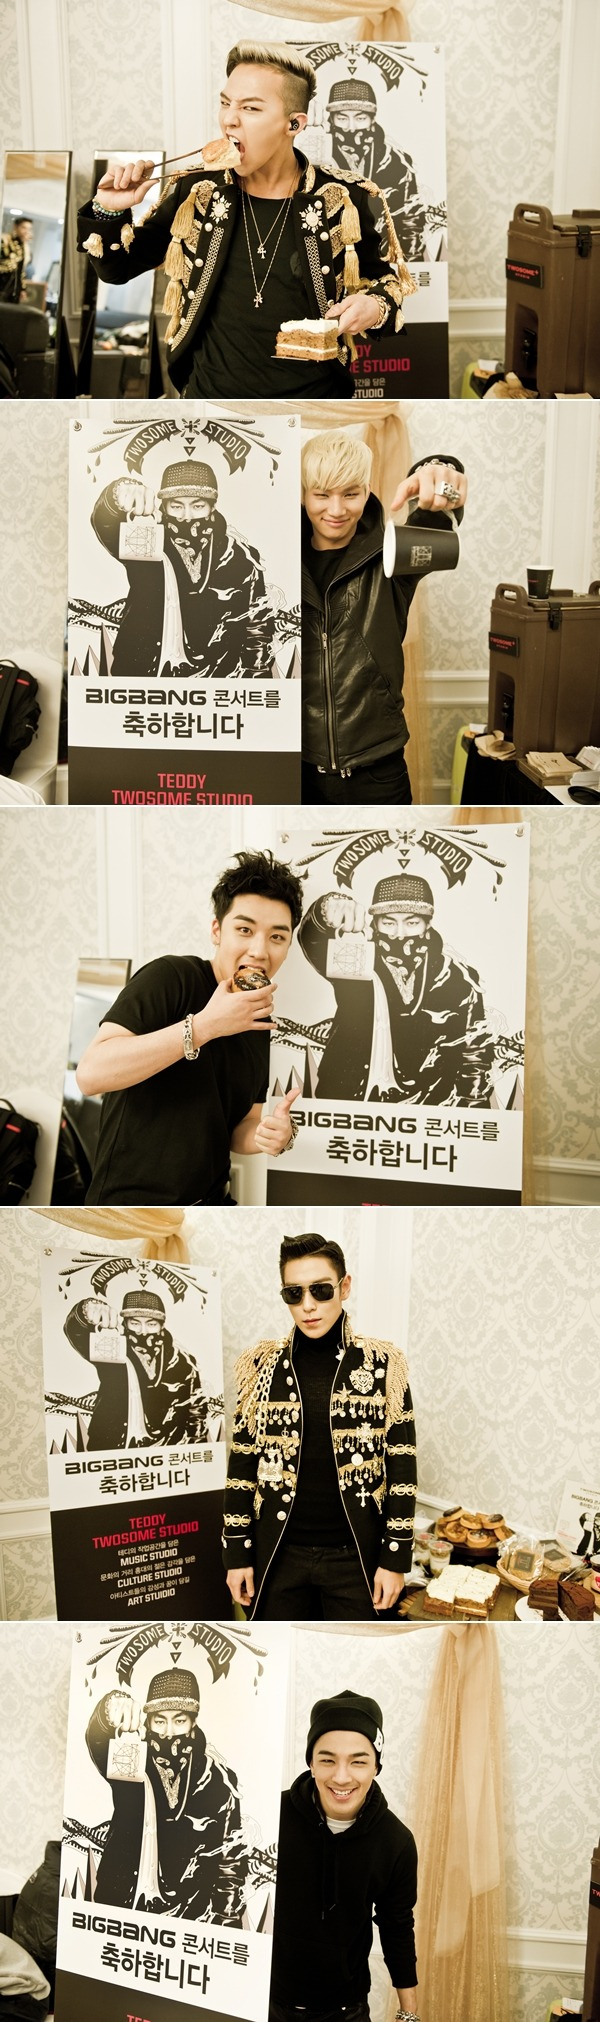 Big Bang - Alive Galaxy Tour 2012 - The Final - Jan2013 - Backstage - 01.jpg